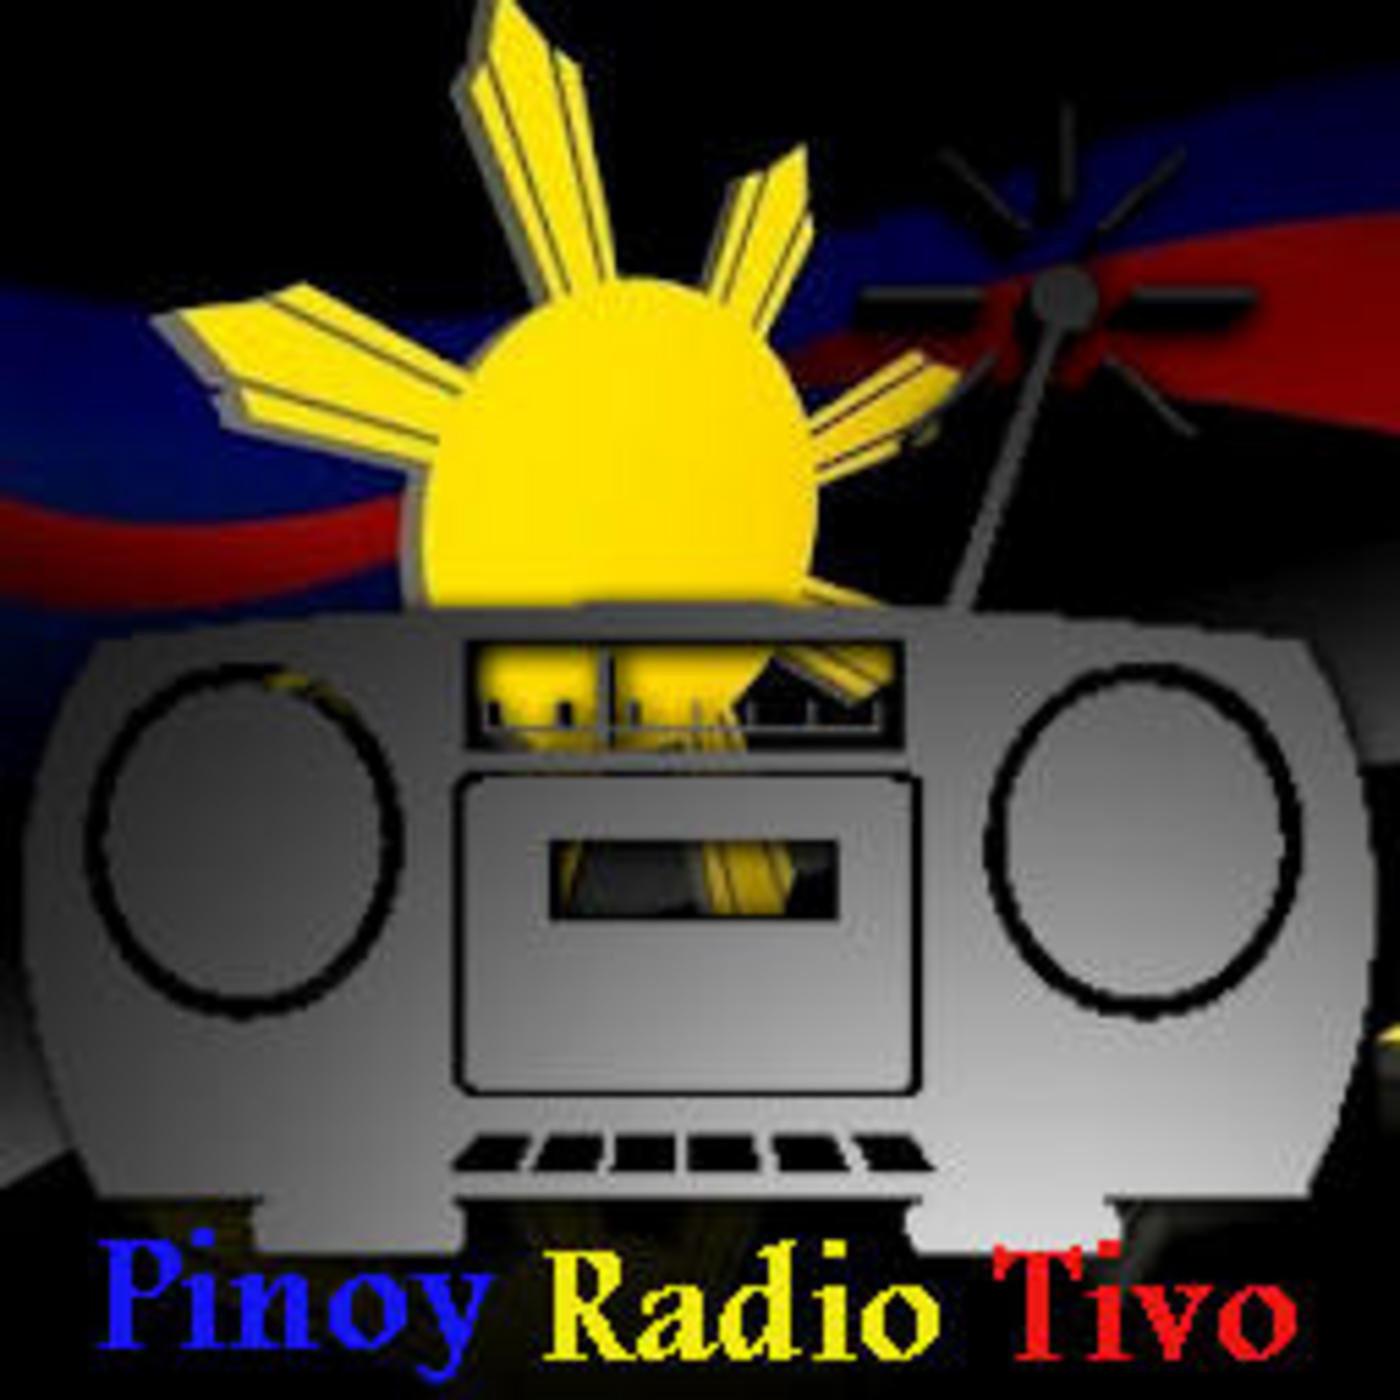 good times morning show 07172017 en pinoy radio tivo en